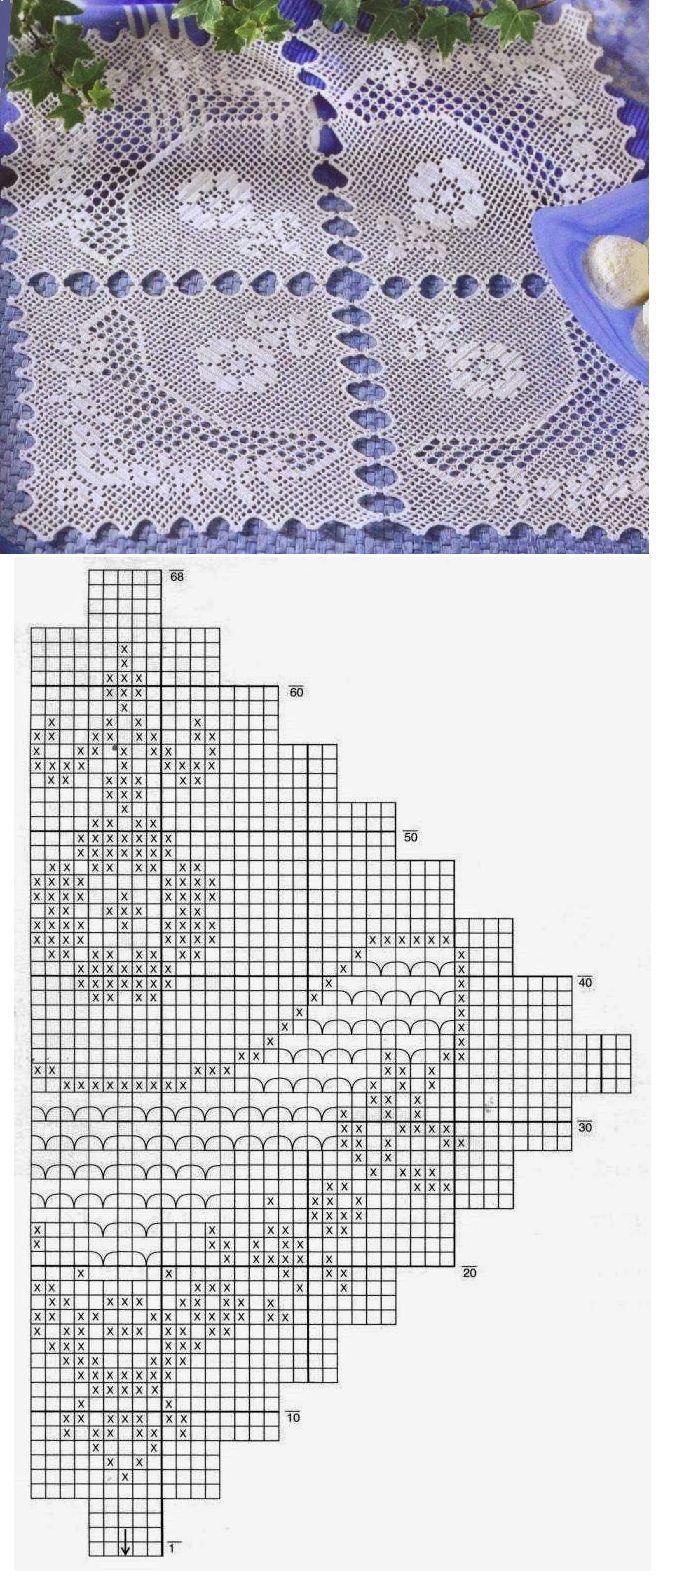 (http://crochetemrevista.blogspot.com.br/search/label/esquema%20crochet%20toalhas)